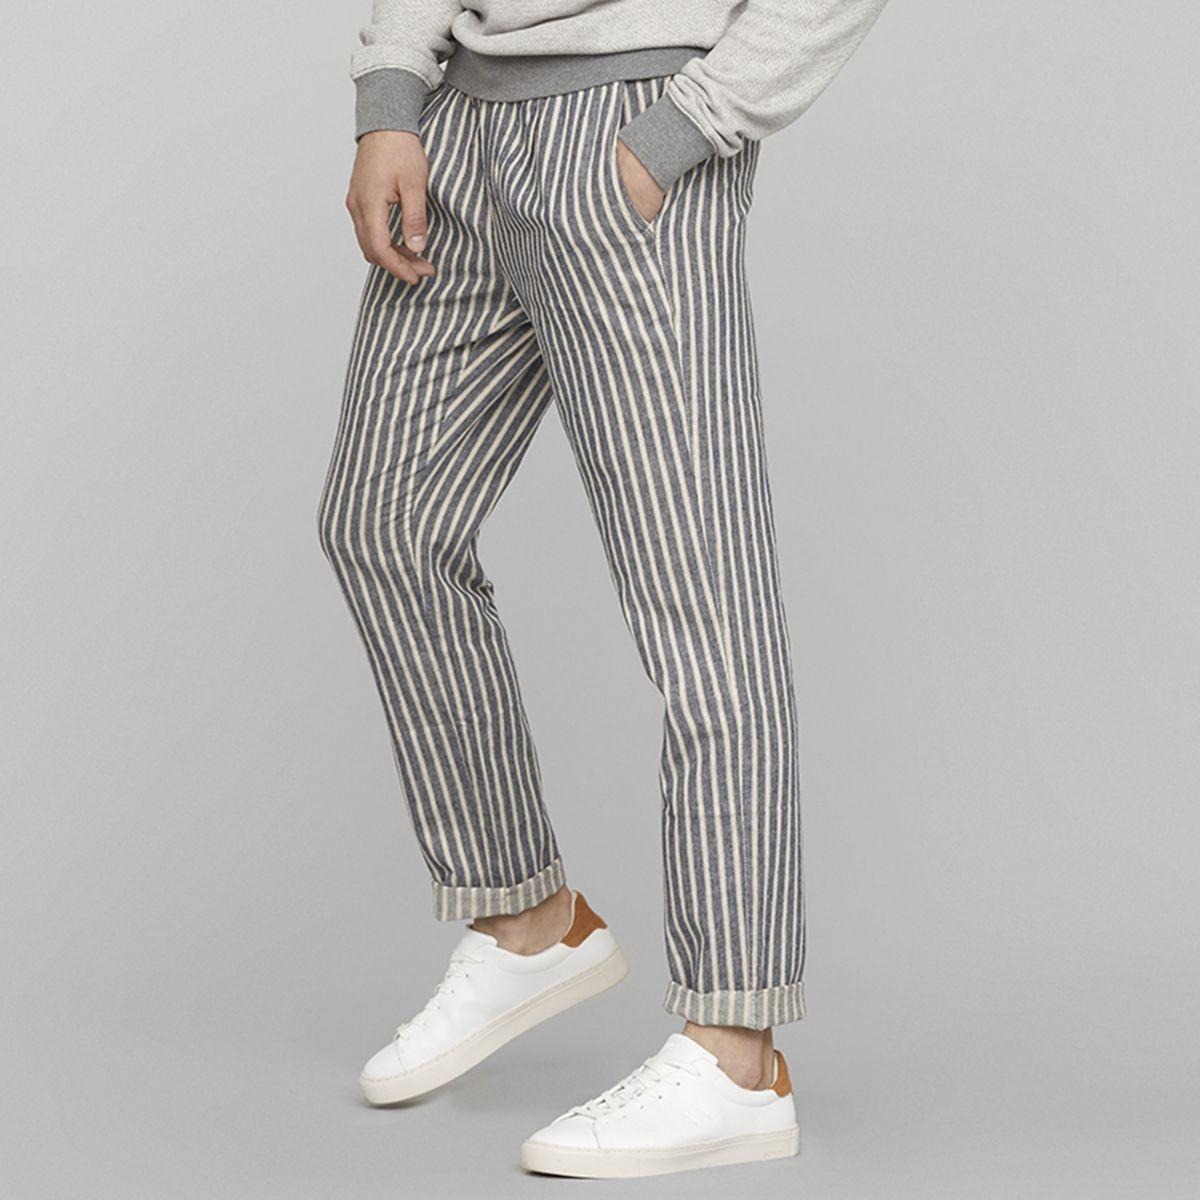 Pantalone SUN68 Fancy Lino...